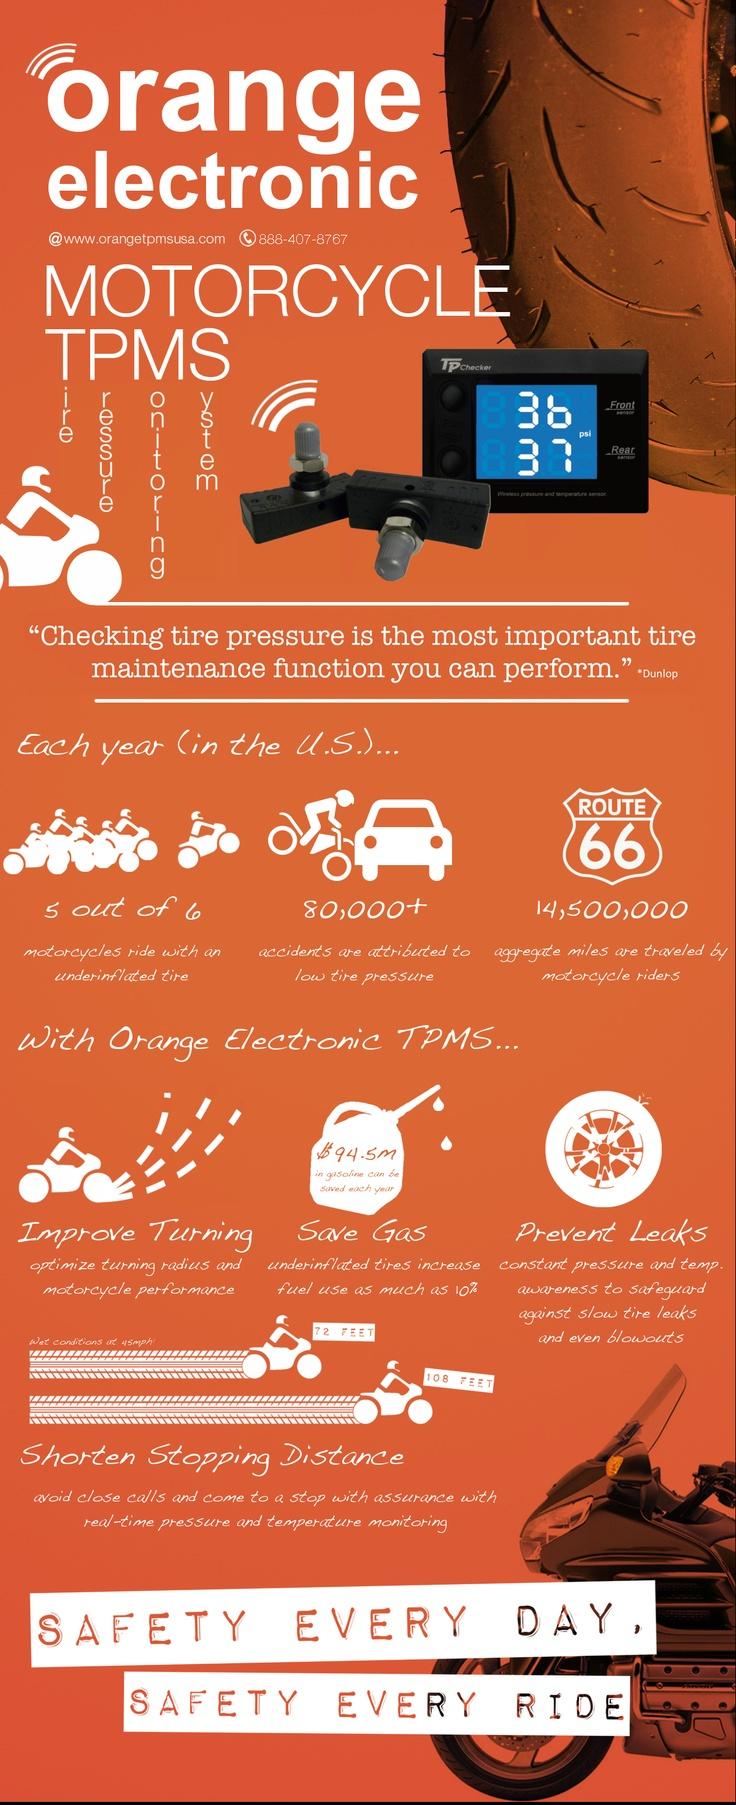 Orange Electronic Motorcycle Tire Pressure Monitoring System - Benefits